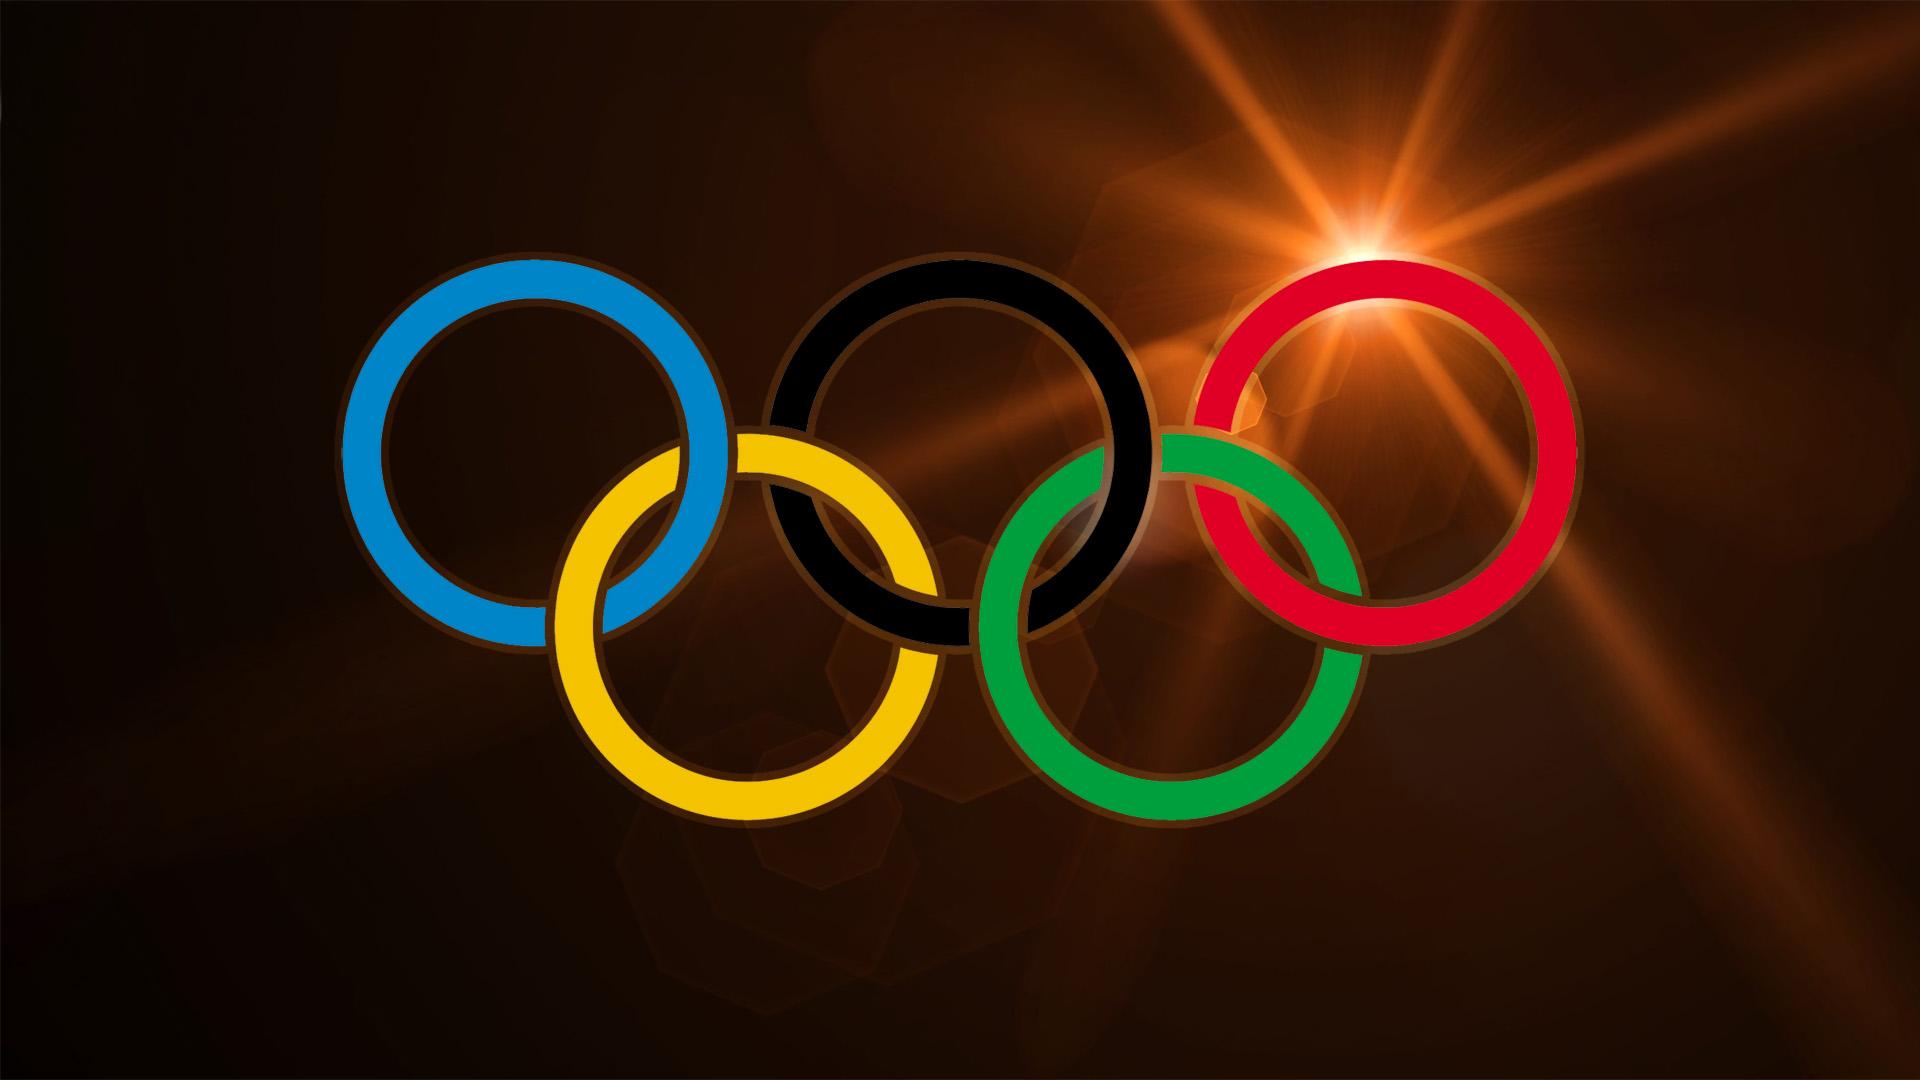 Olympische Ringe Hd